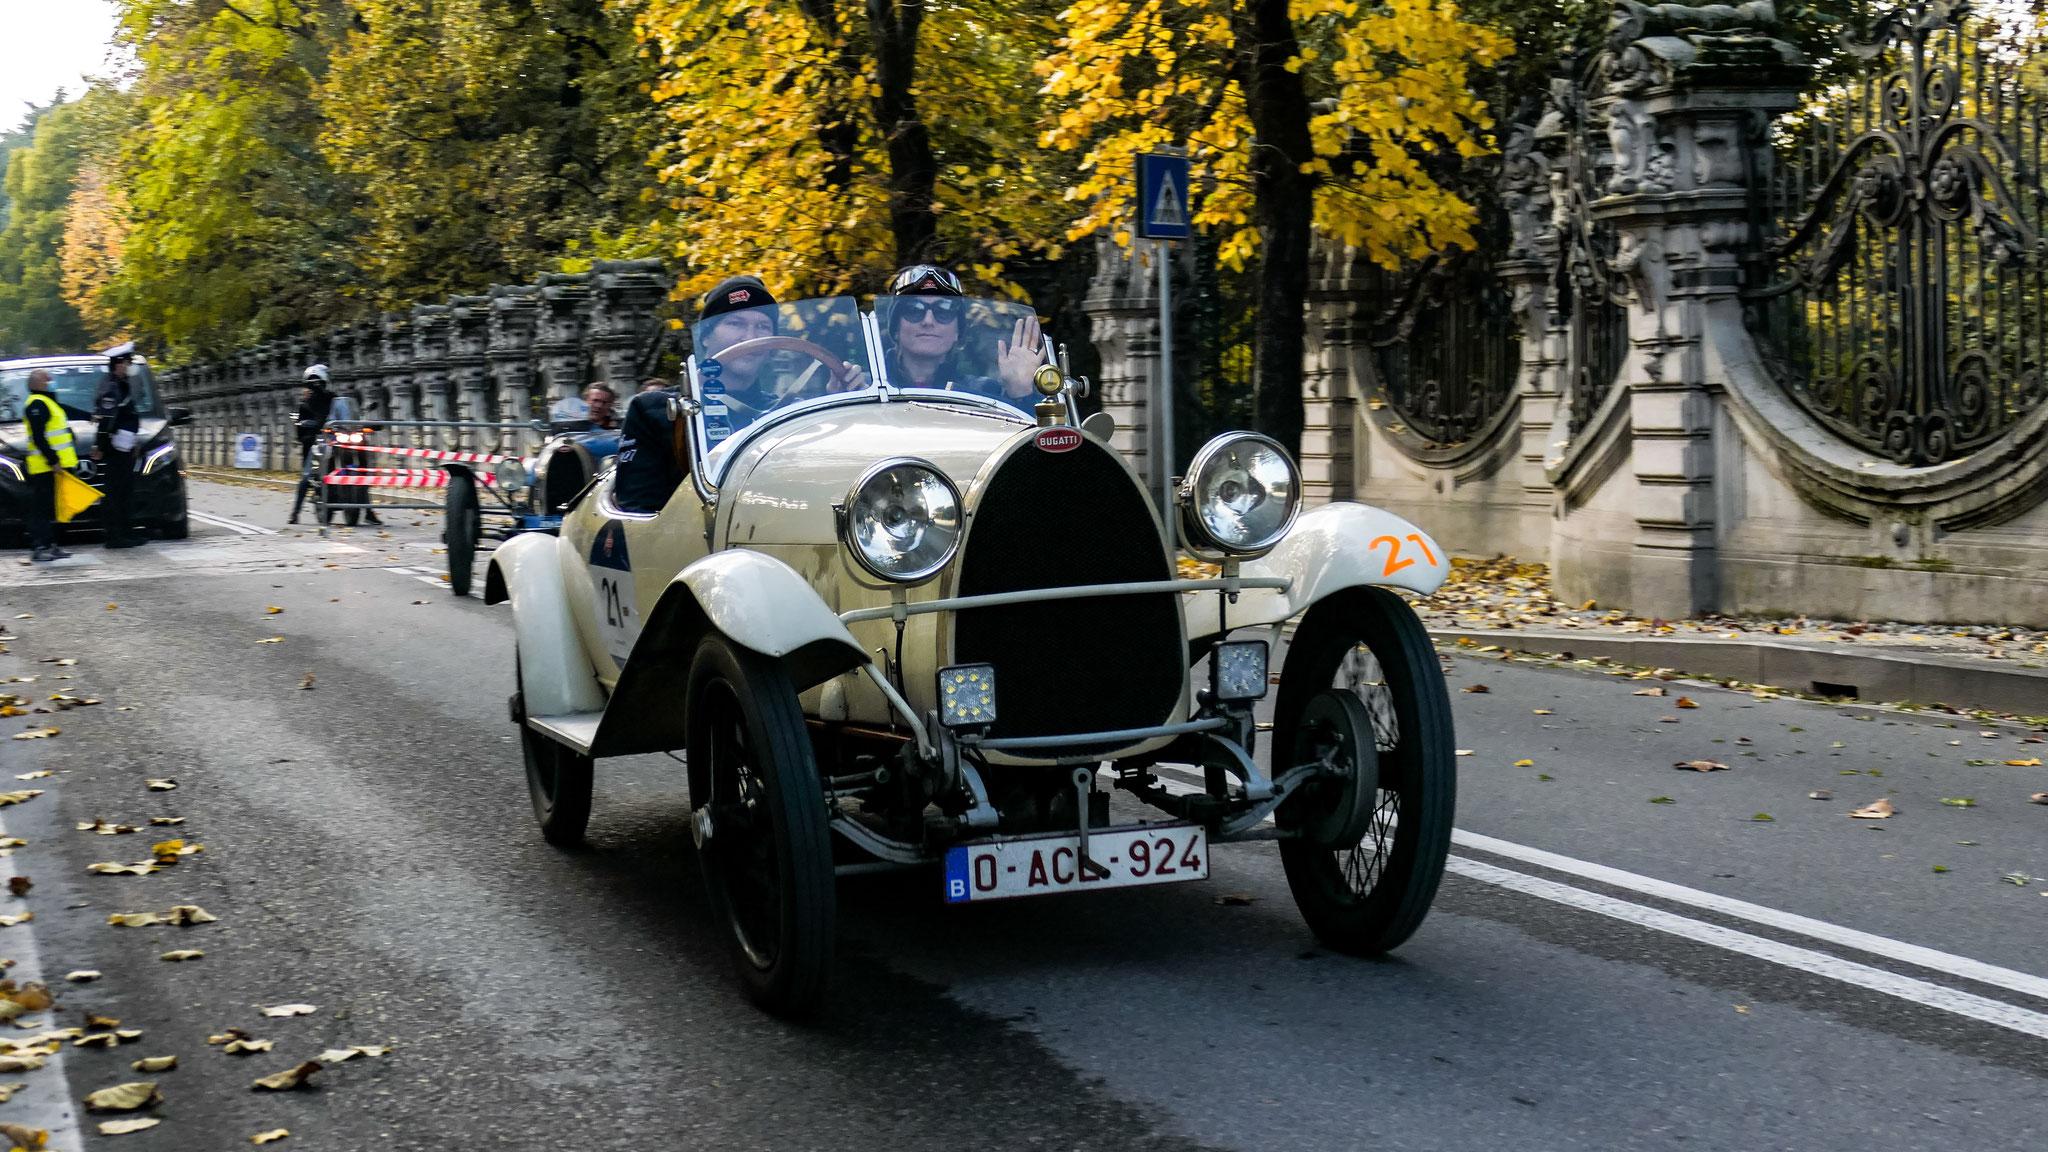 Bugatti Type 23 Brescia - 0-ACL-924 (BEL)